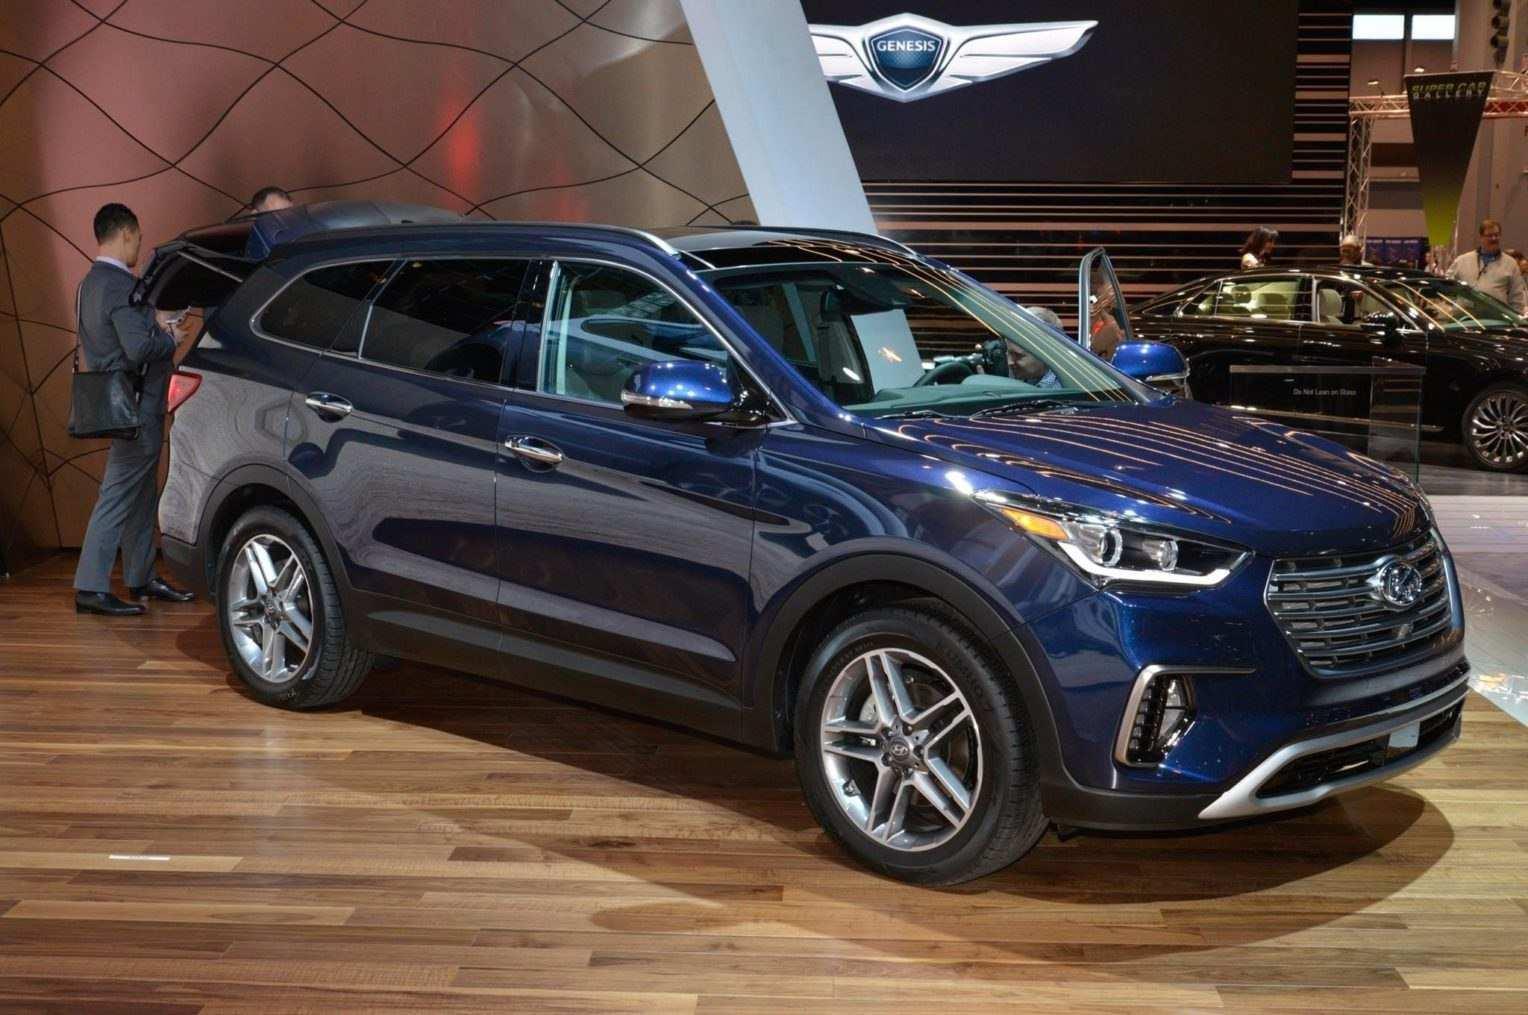 37 All New 2020 Hyundai Veracruz 2018 Redesign and Concept by 2020 Hyundai Veracruz 2018